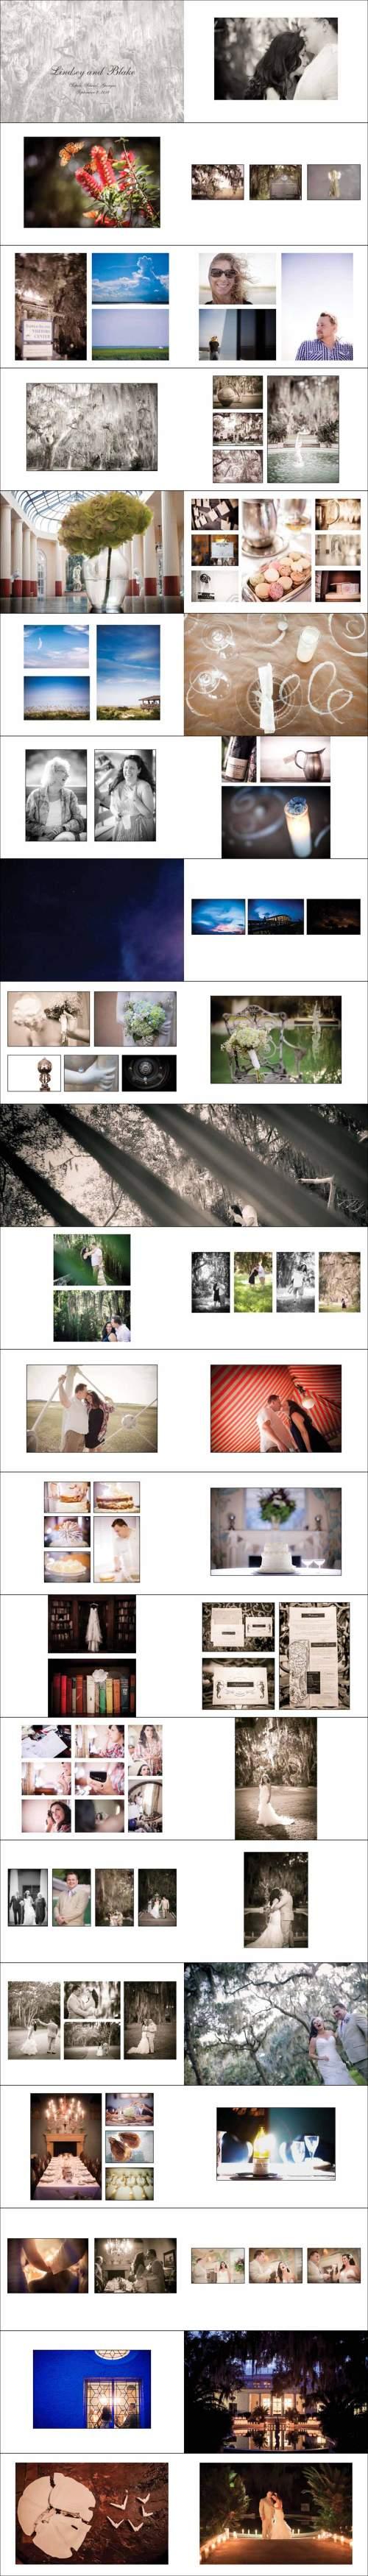 SampleAlbum-©2013TraciArneyPhotography